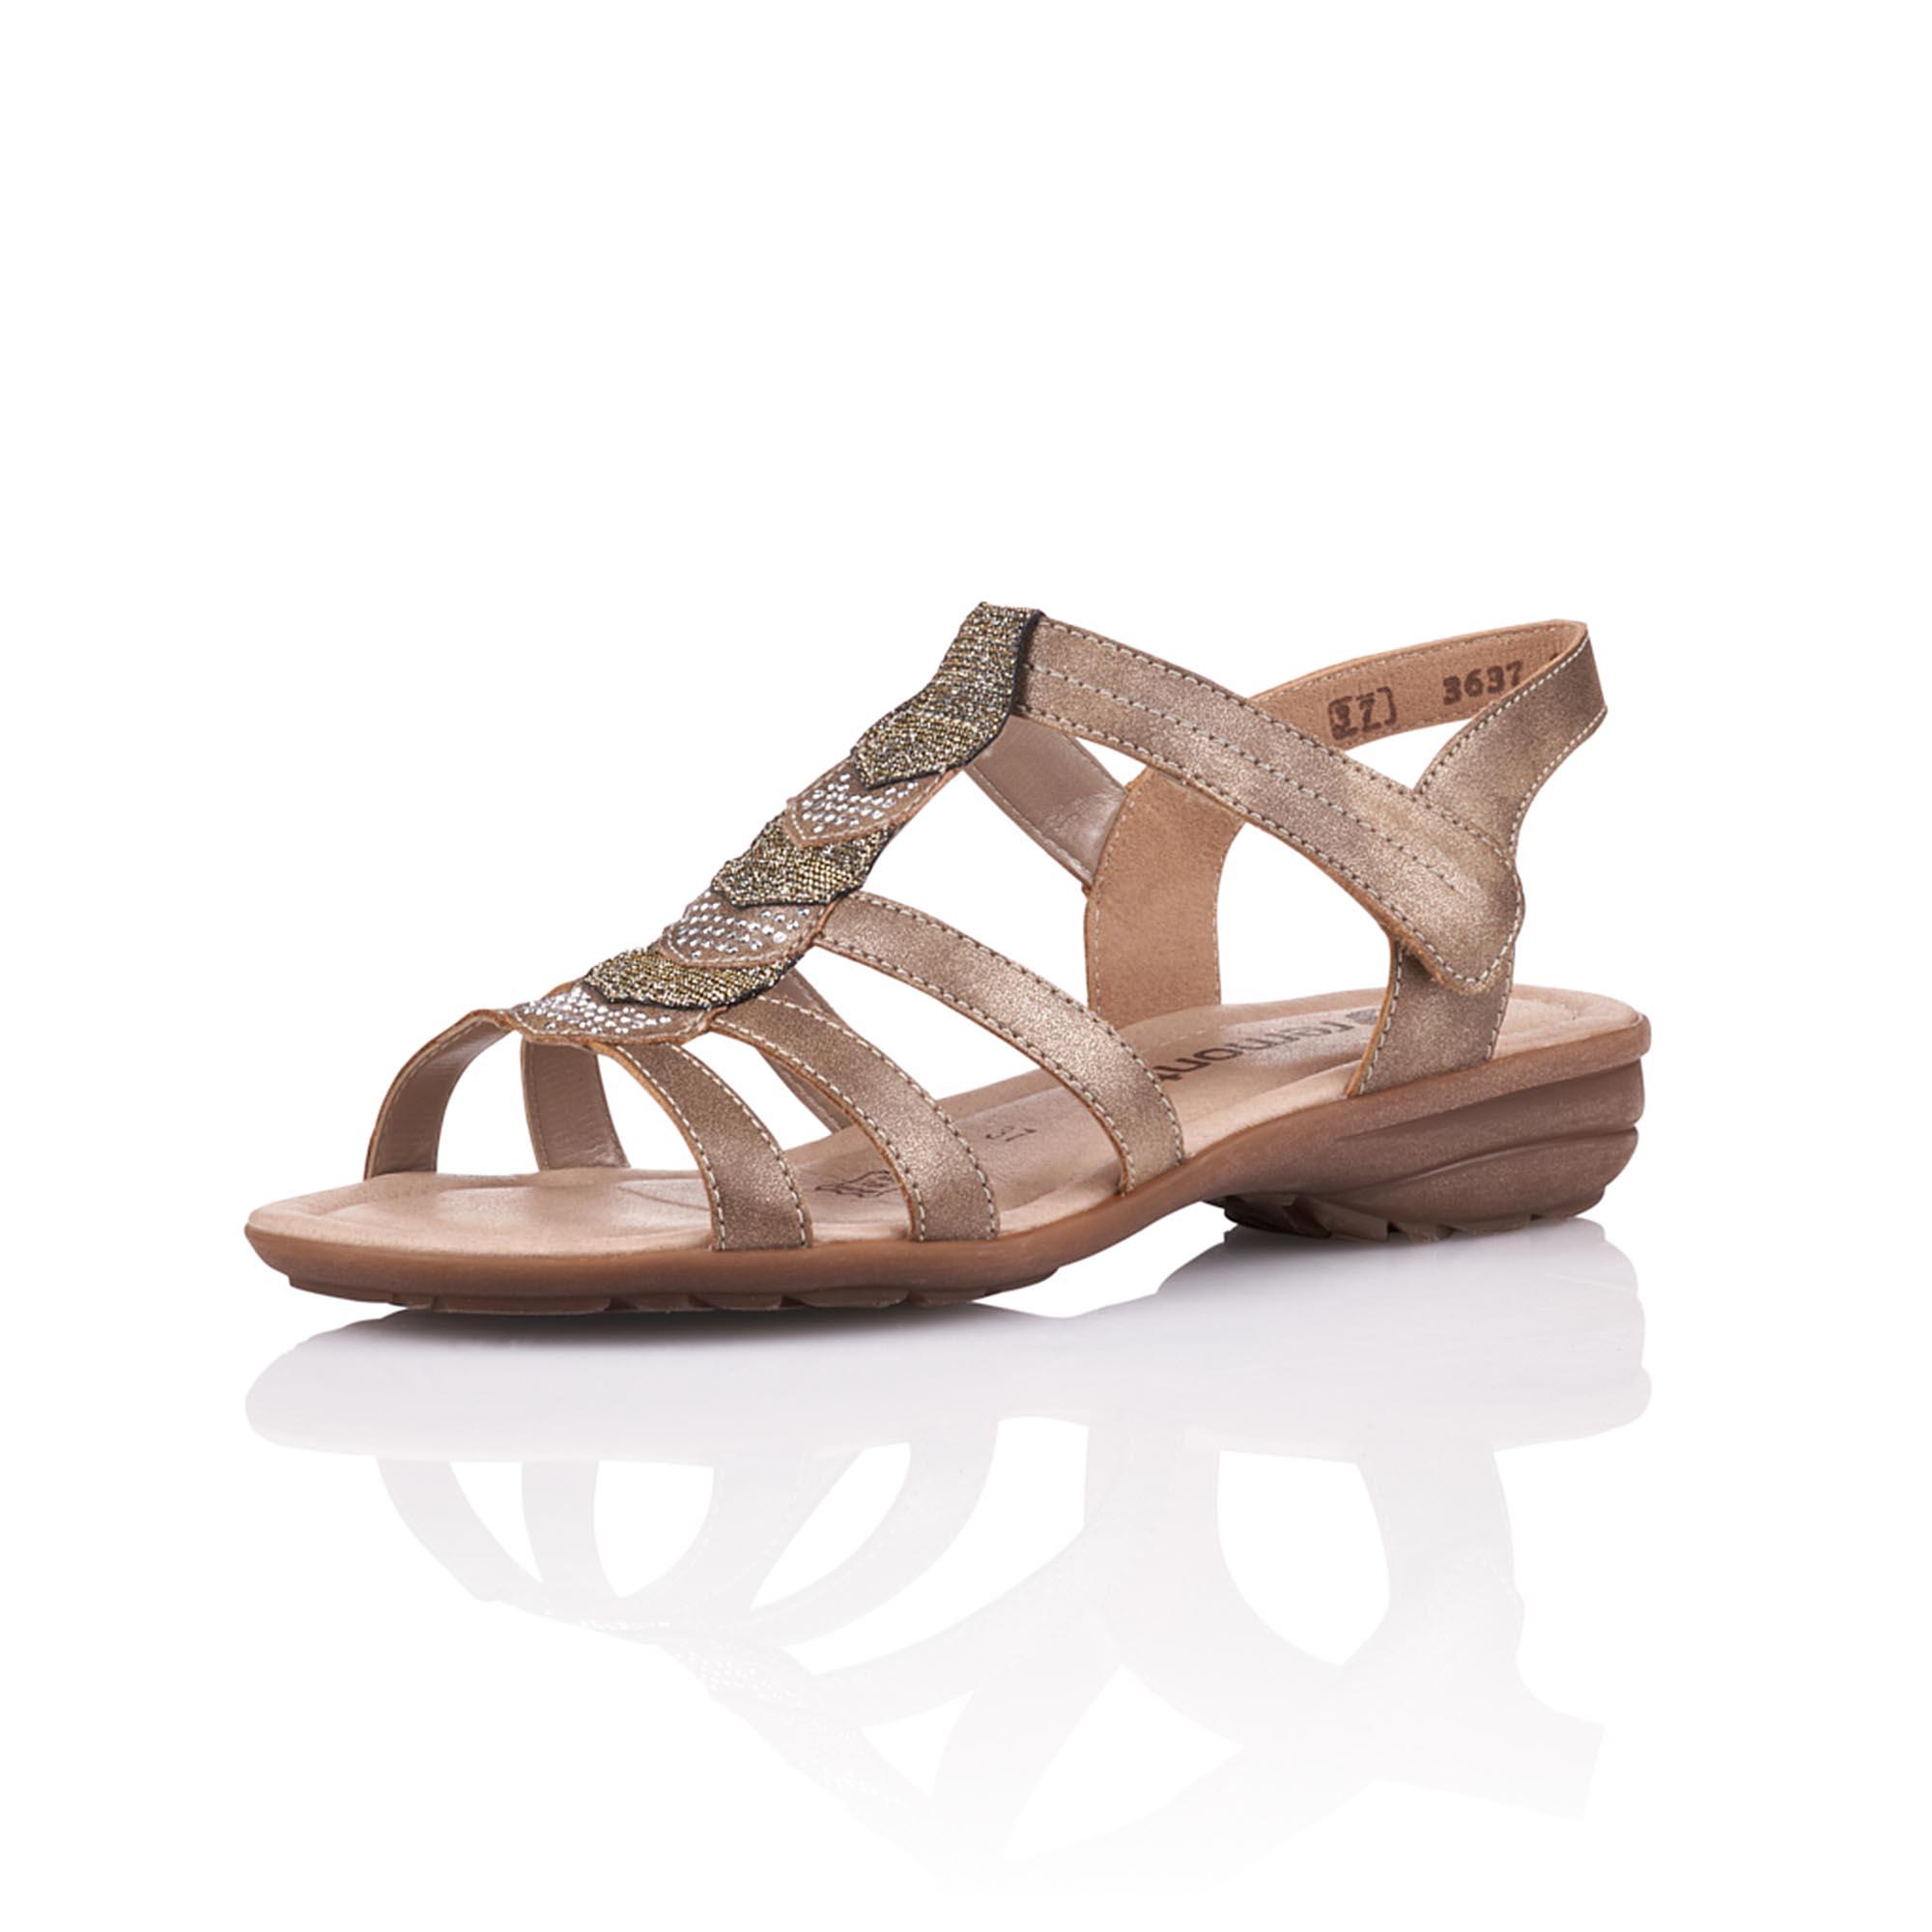 631e70f5bce4 detail Dámska obuv RIEKER - REMONTE br R3637-90 GOLD F S